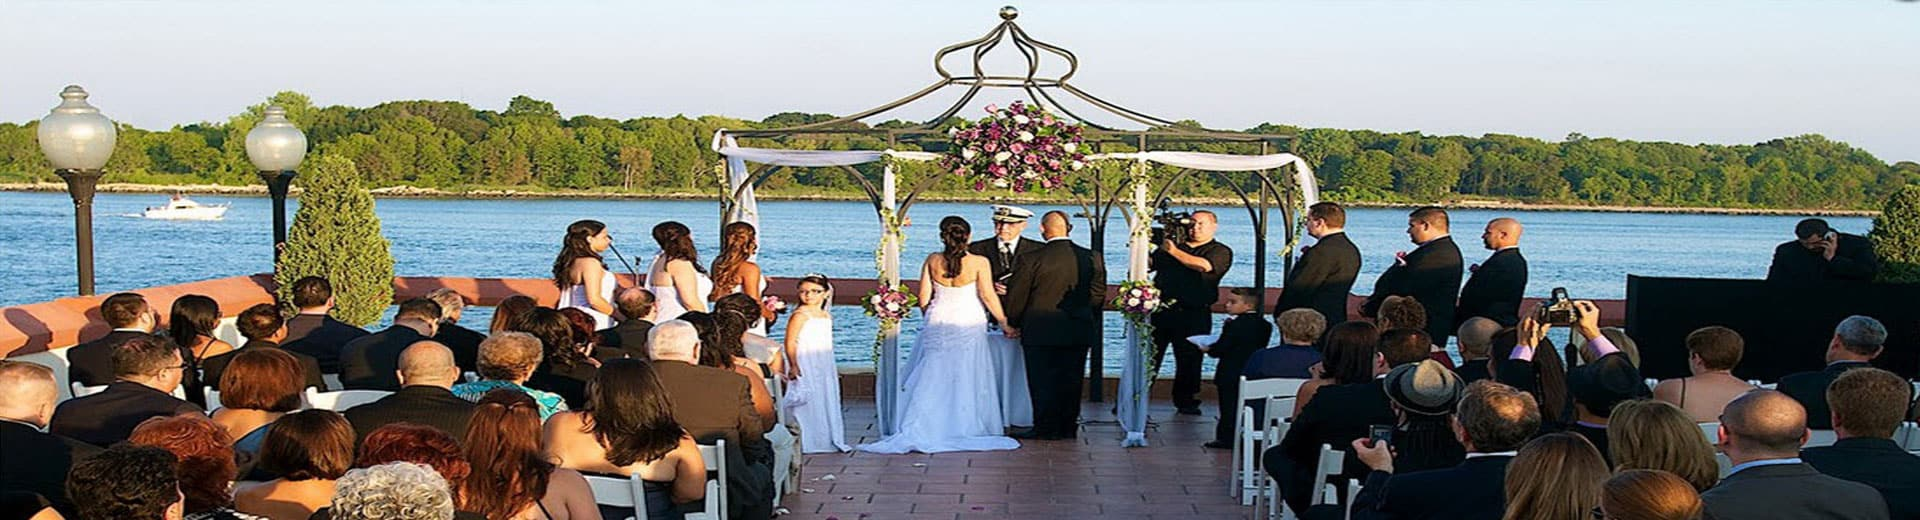 Nautical Wedding Bells